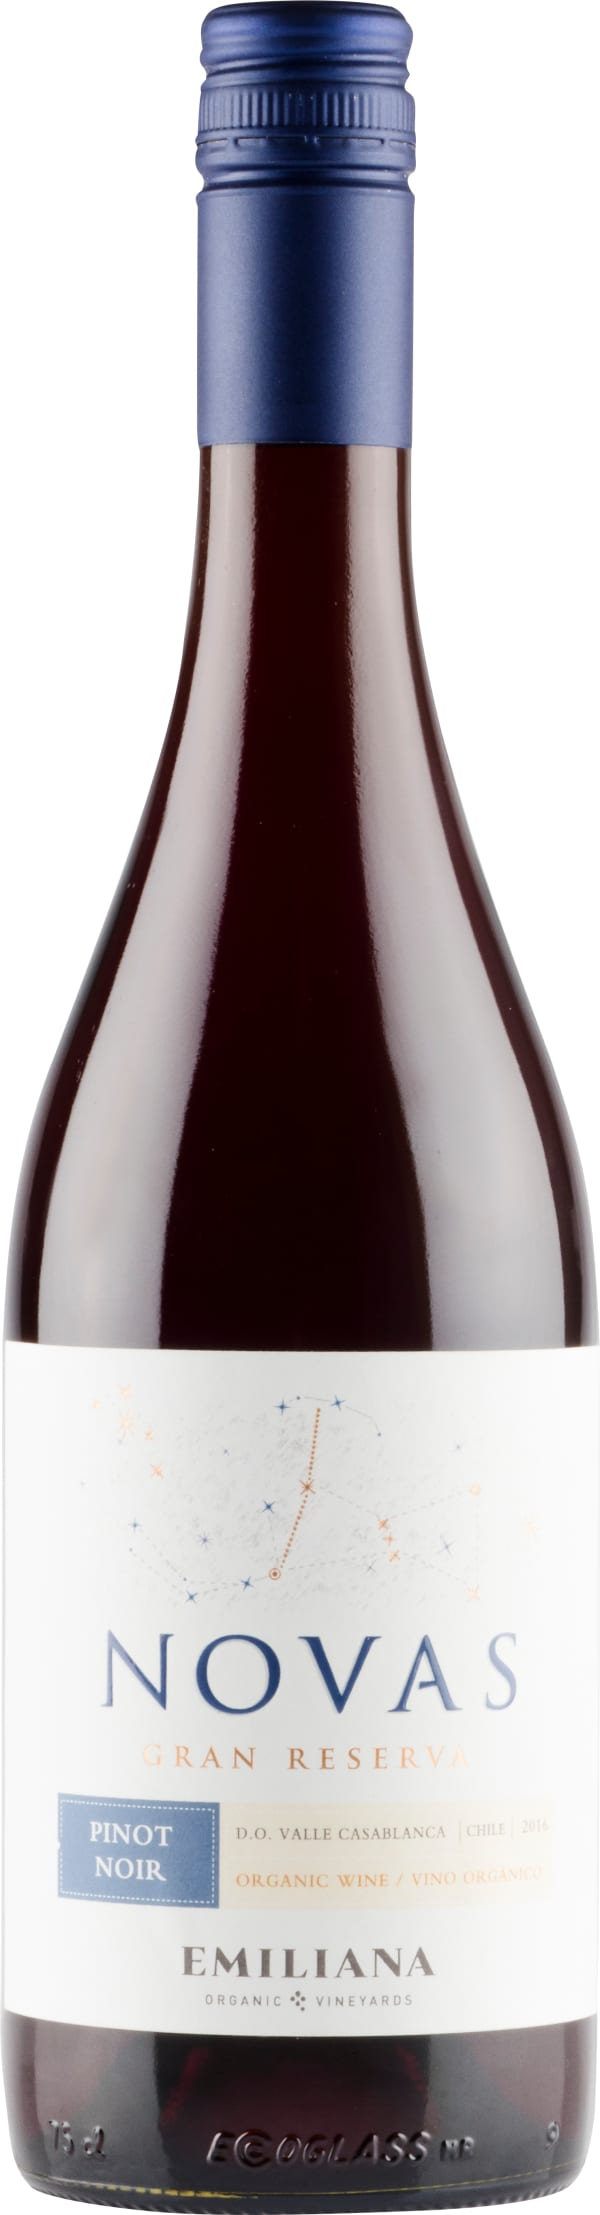 Novas Gran Reserva Pinot Noir 2018